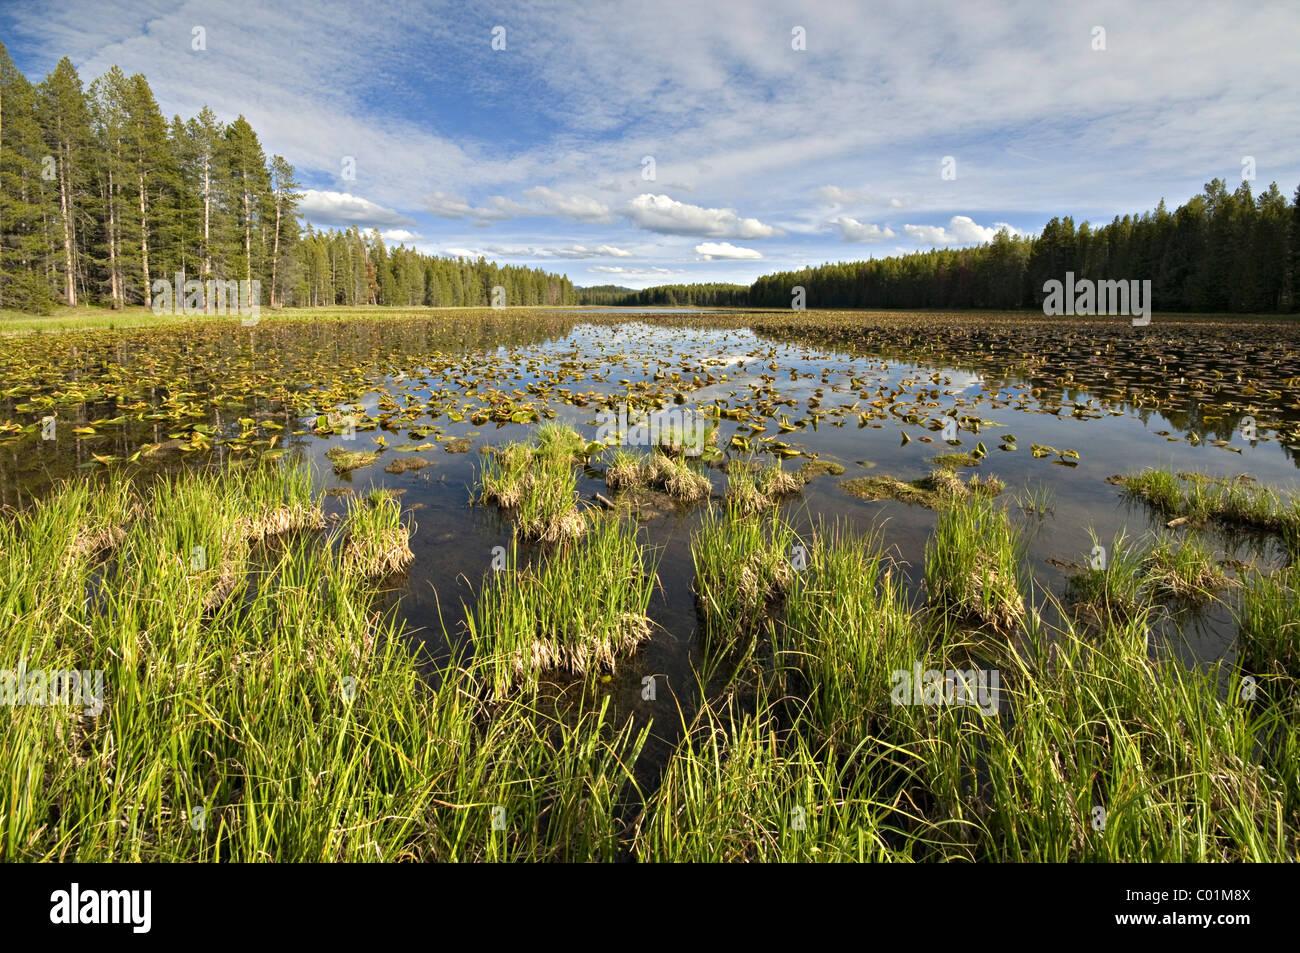 Swan Lake, Colter Bay, Grand Teton National Park, Wyoming, USA, North America Stock Photo